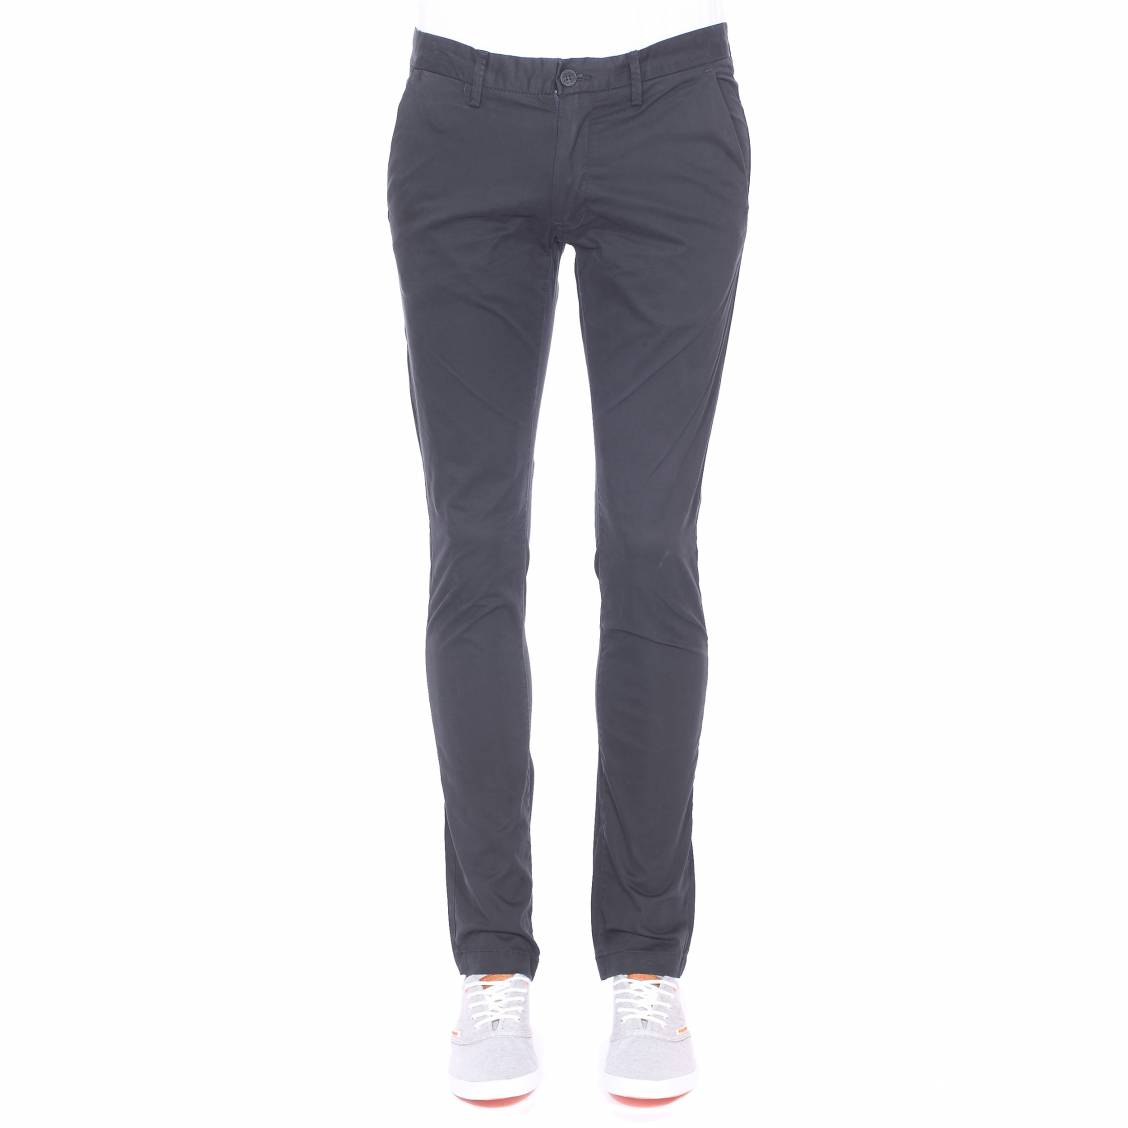 Pantalon chino slim Teddy Smith noir